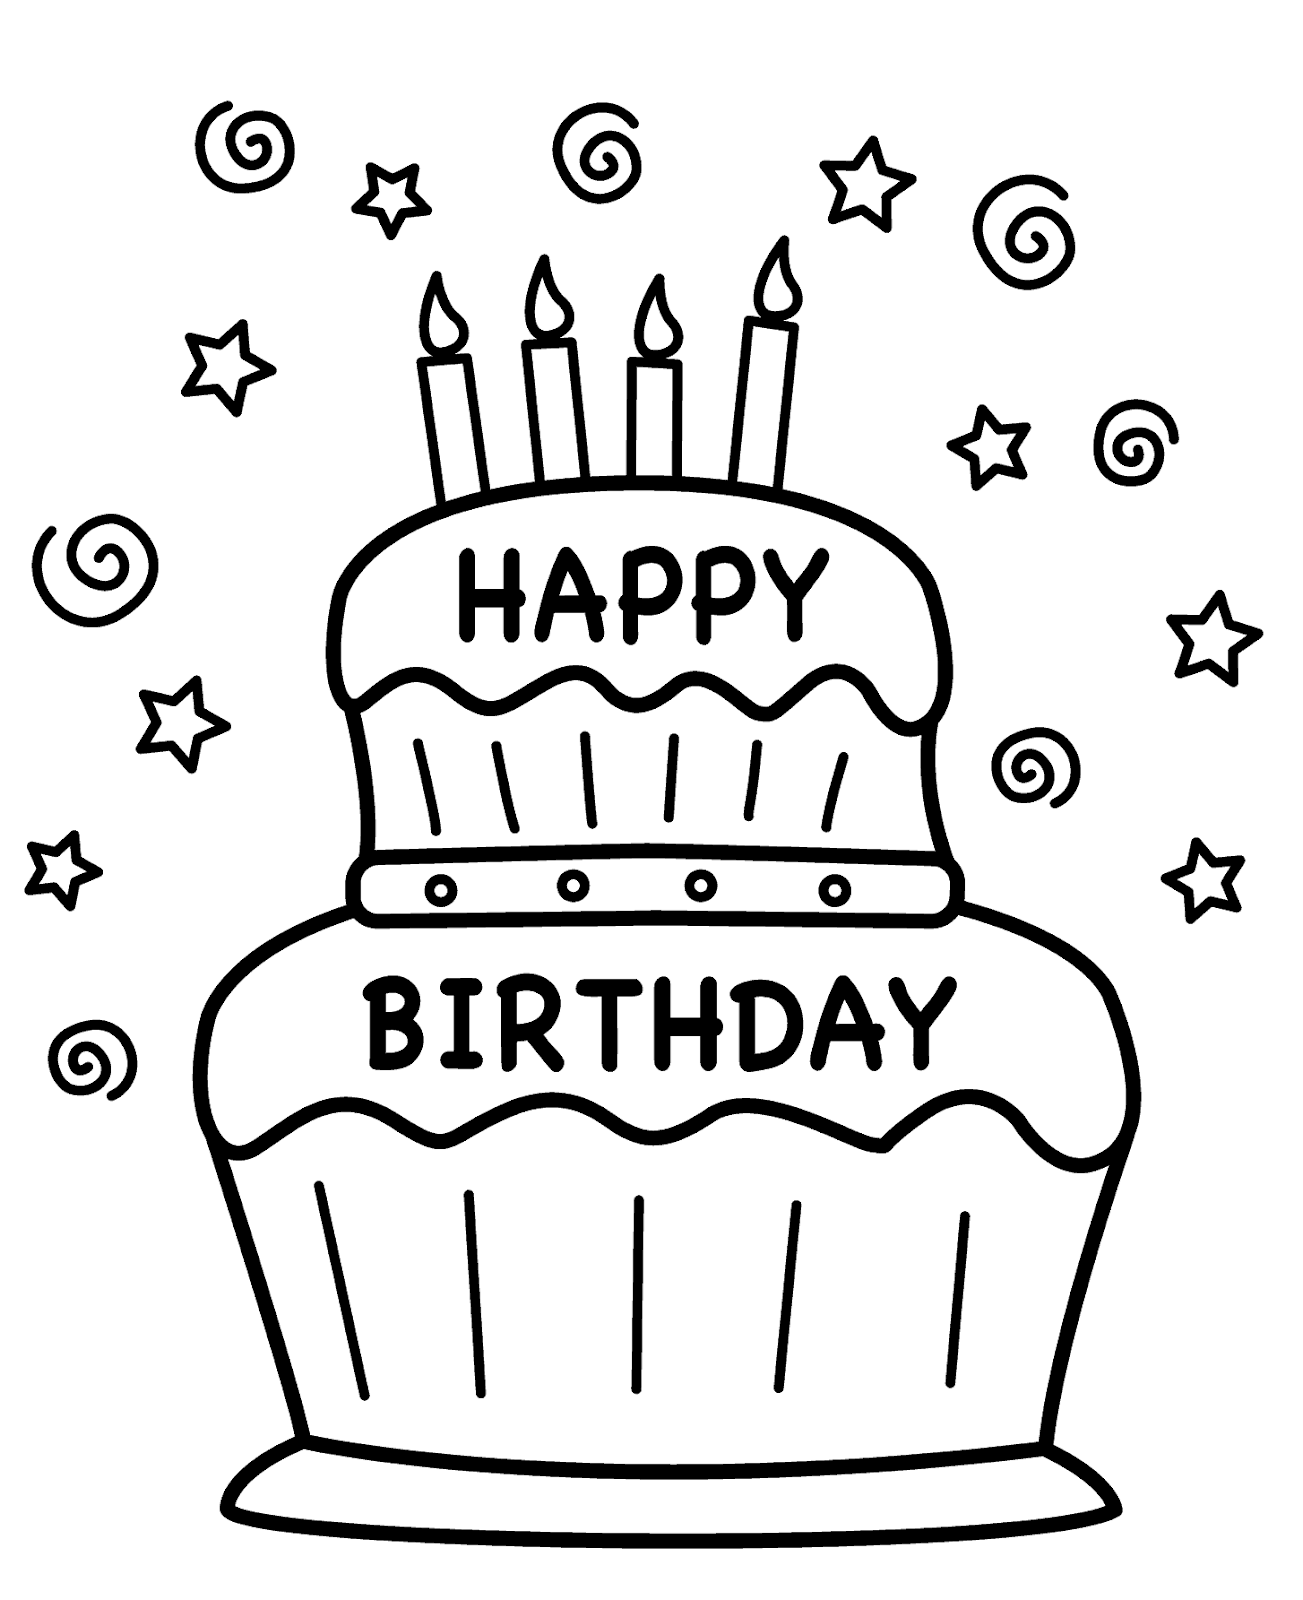 Mewarnai Kue Ulang Tahun : mewarnai, ulang, tahun, Kumpulan, Gambar, Mewarnai, Ulang, Tahun, Terbaru, Gambarcoloring